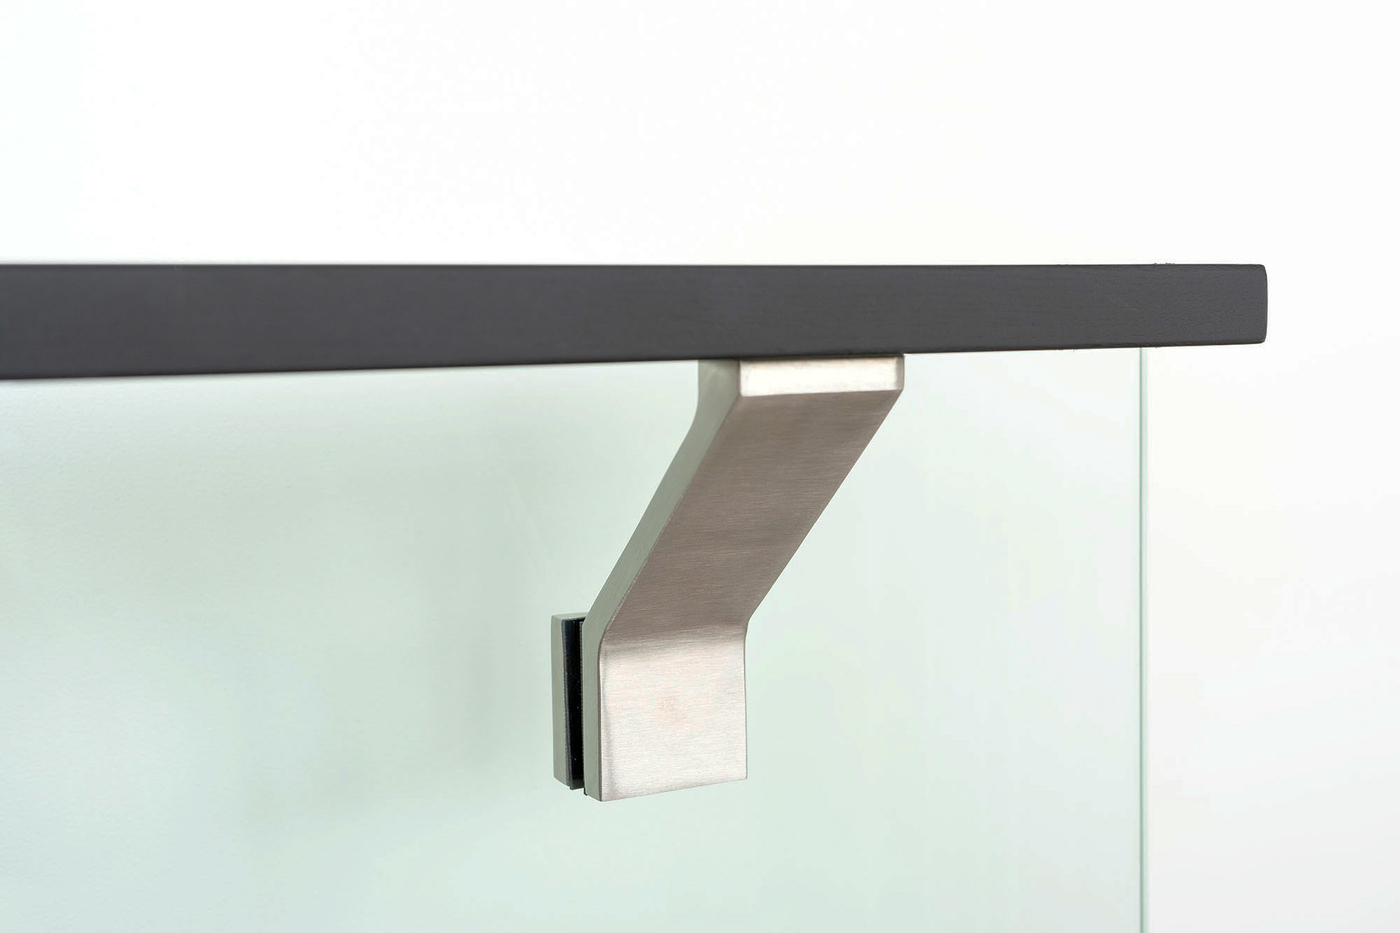 Modern-glass-mounted-handrail-brackets